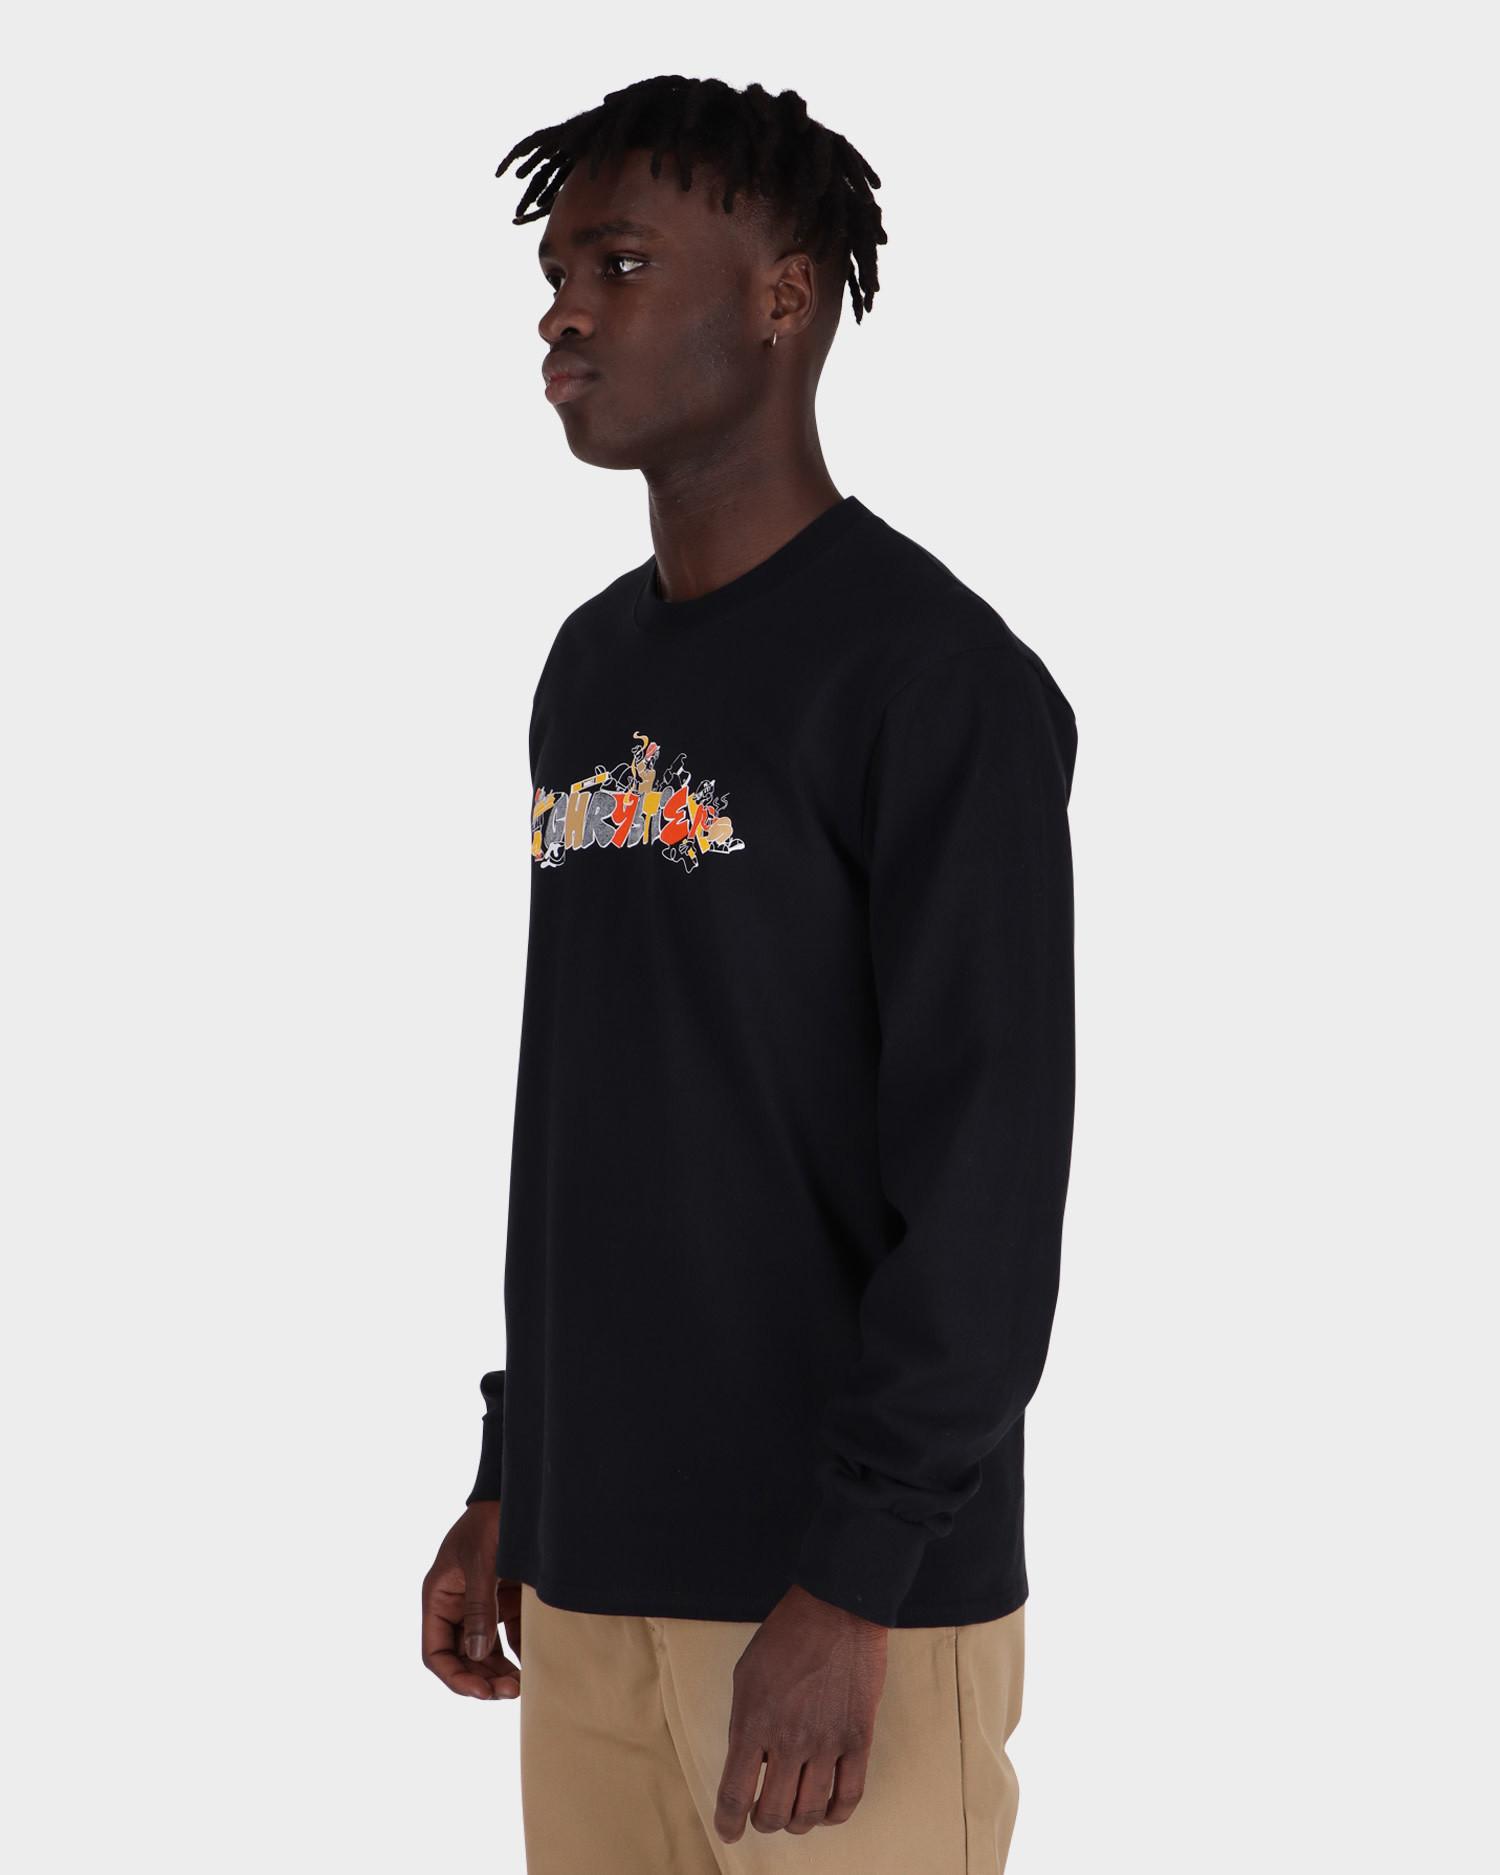 Chrystie NYC - NYC Workers Longsleeve T-Shirt black